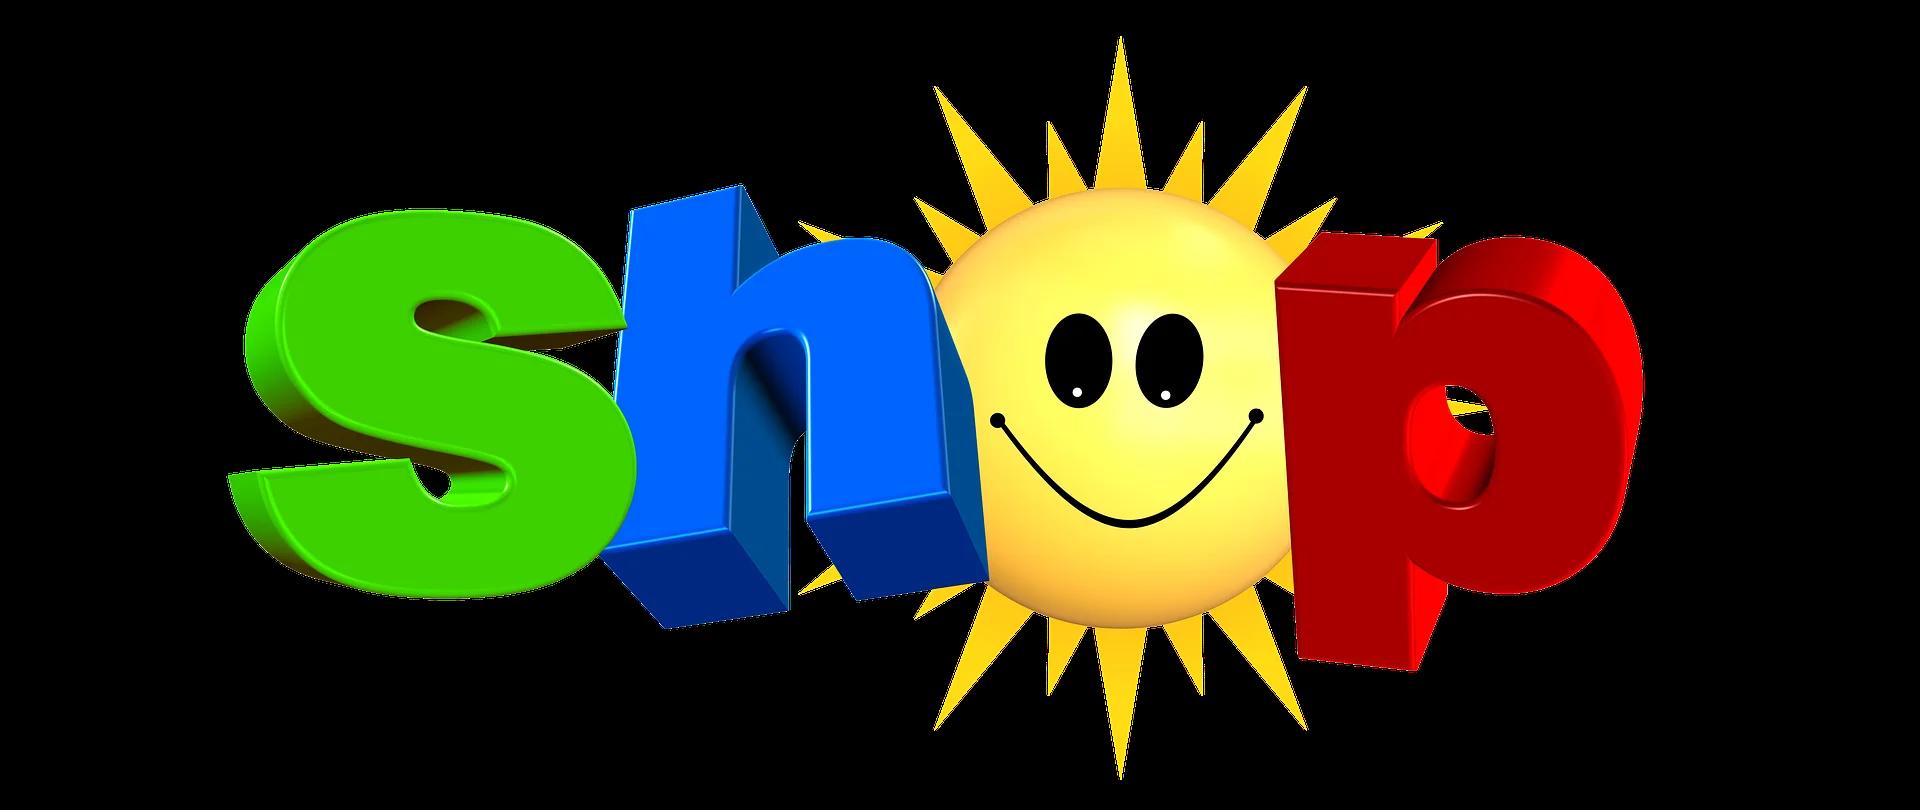 logo-belanja-shop-cartoon-kartun-nettpeople